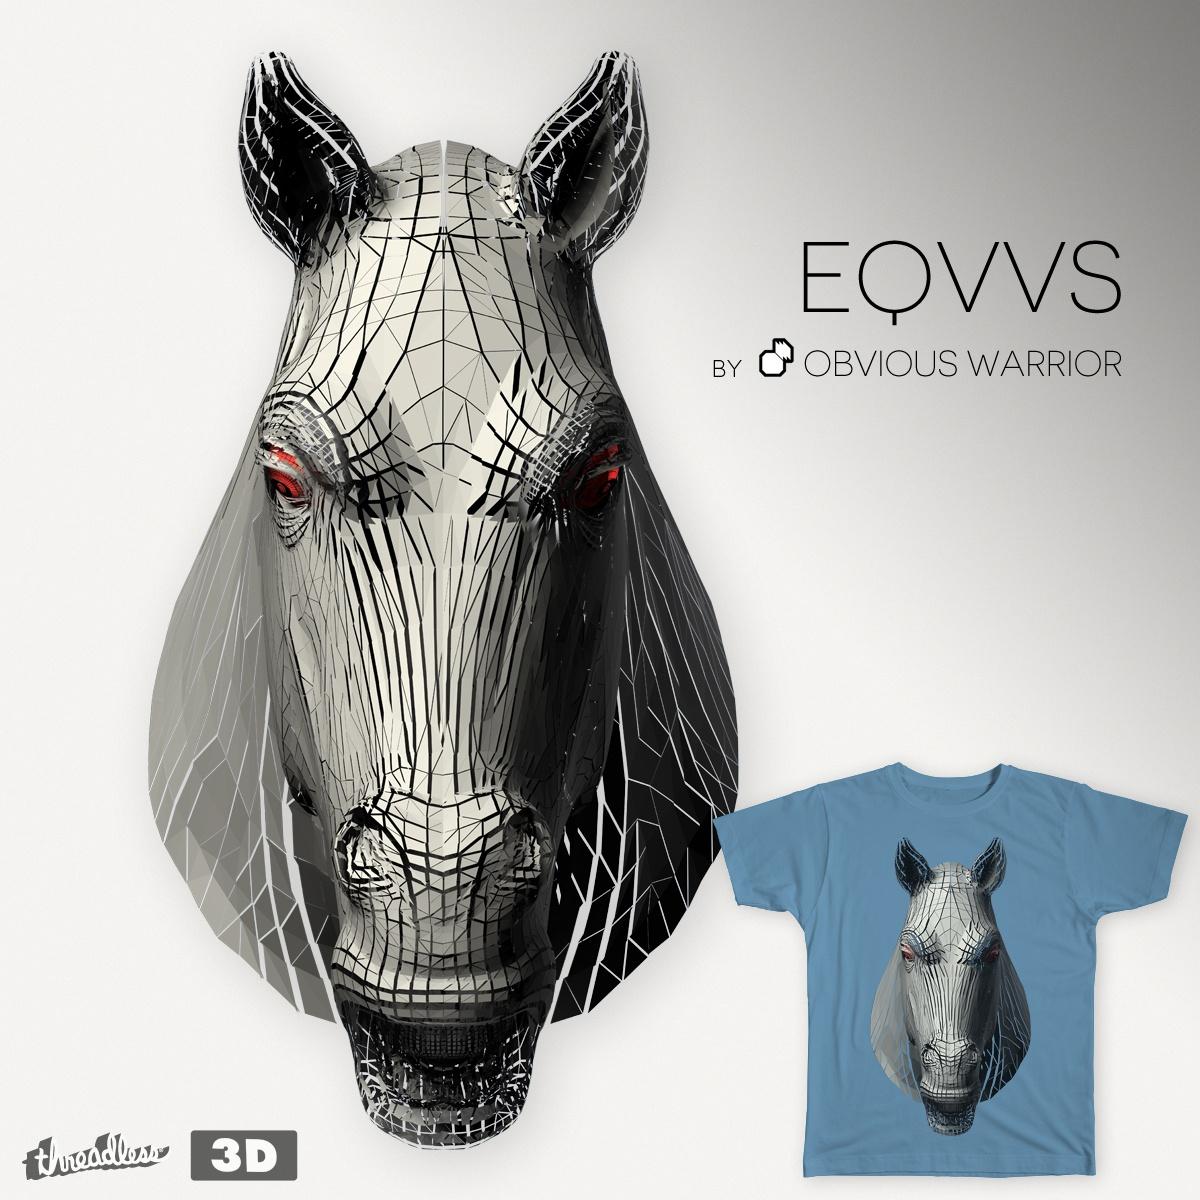 EQVVS by obviouswarrior on Threadless